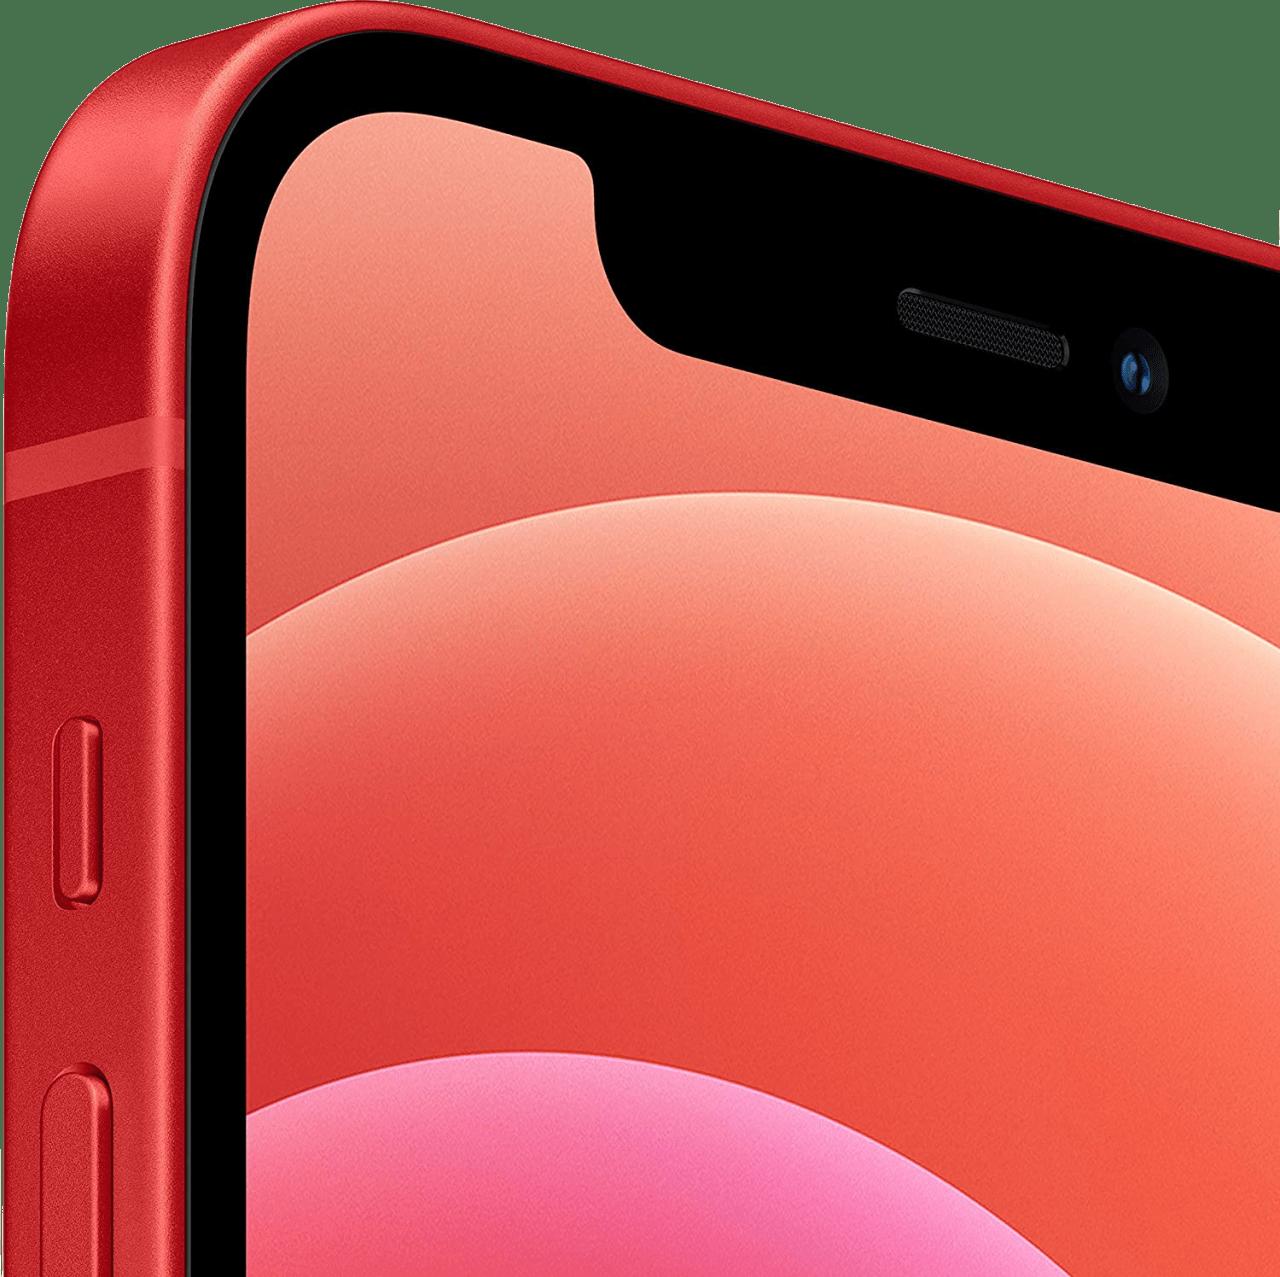 (Product)Red Apple iPhone 12 mini 128GB.3